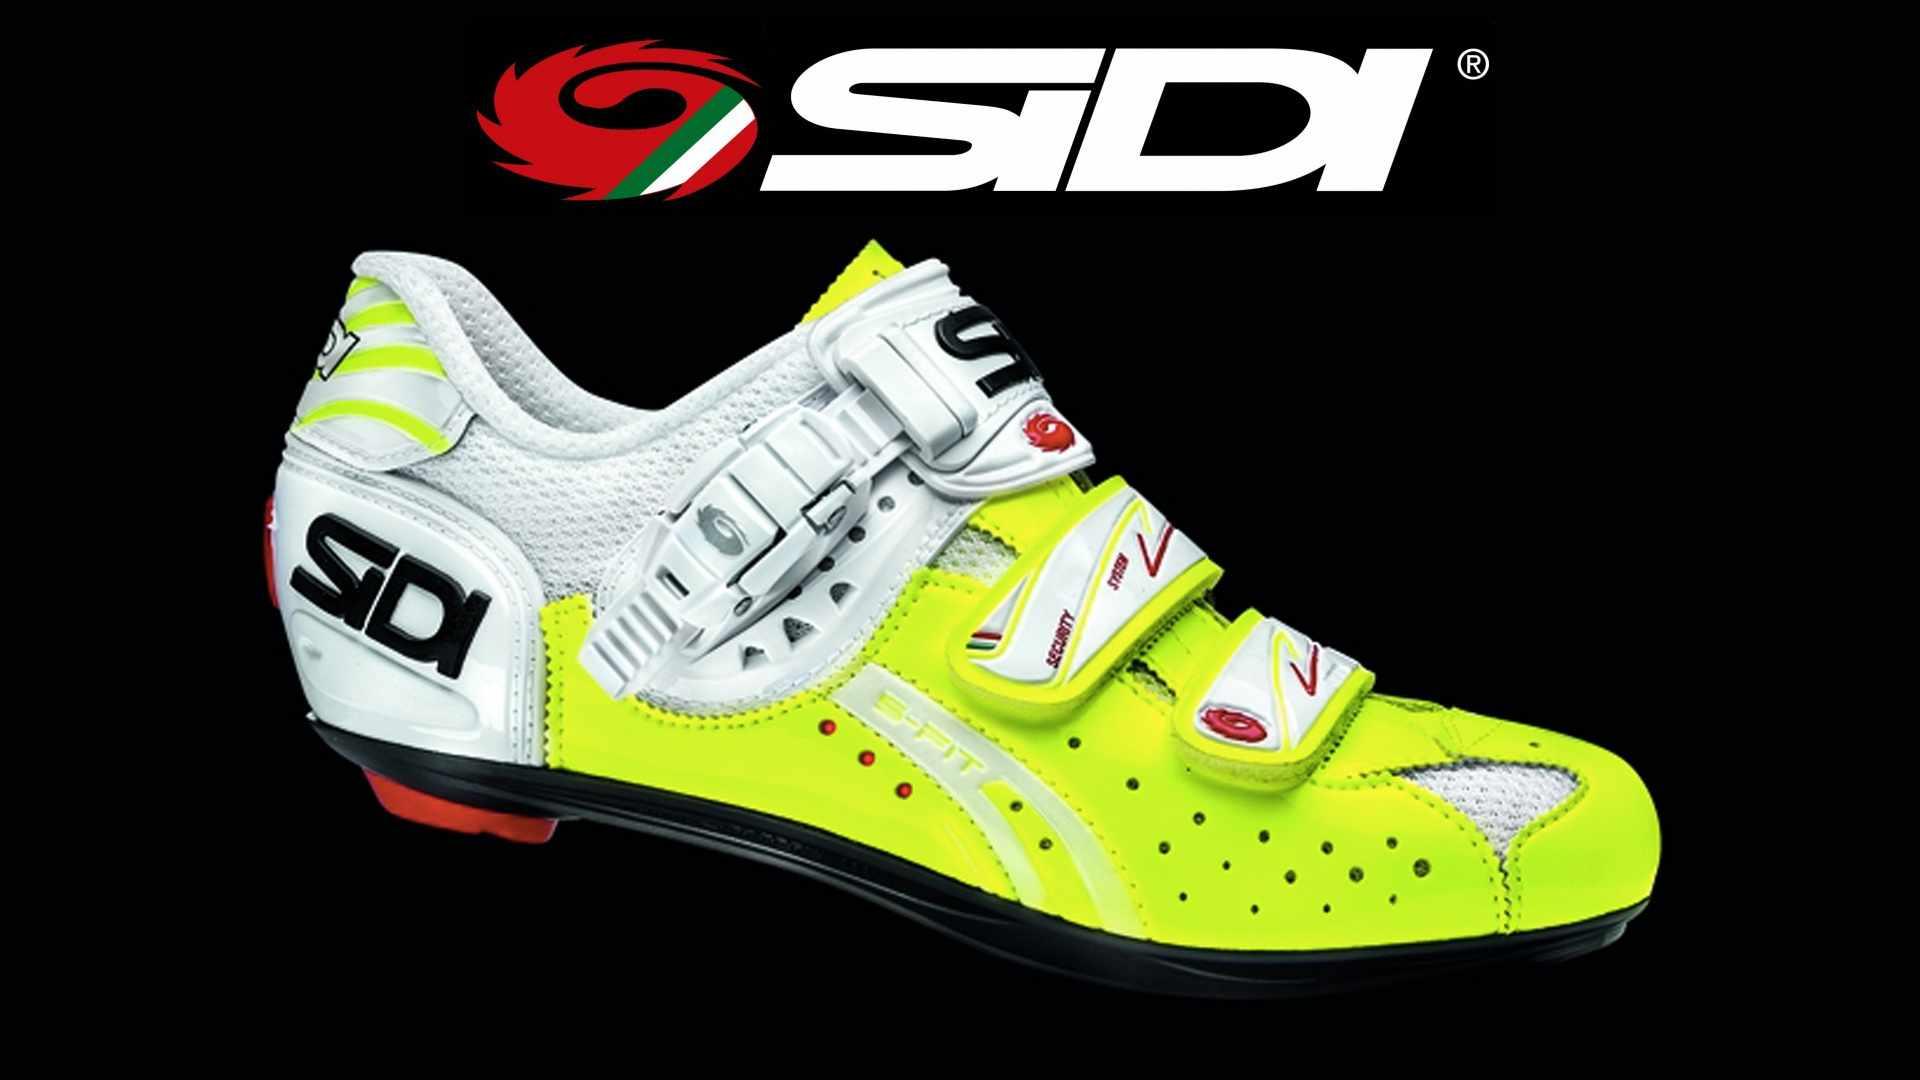 Sidi Sport has announced an exclusive UK distribution partnership with Saddleback Ltd